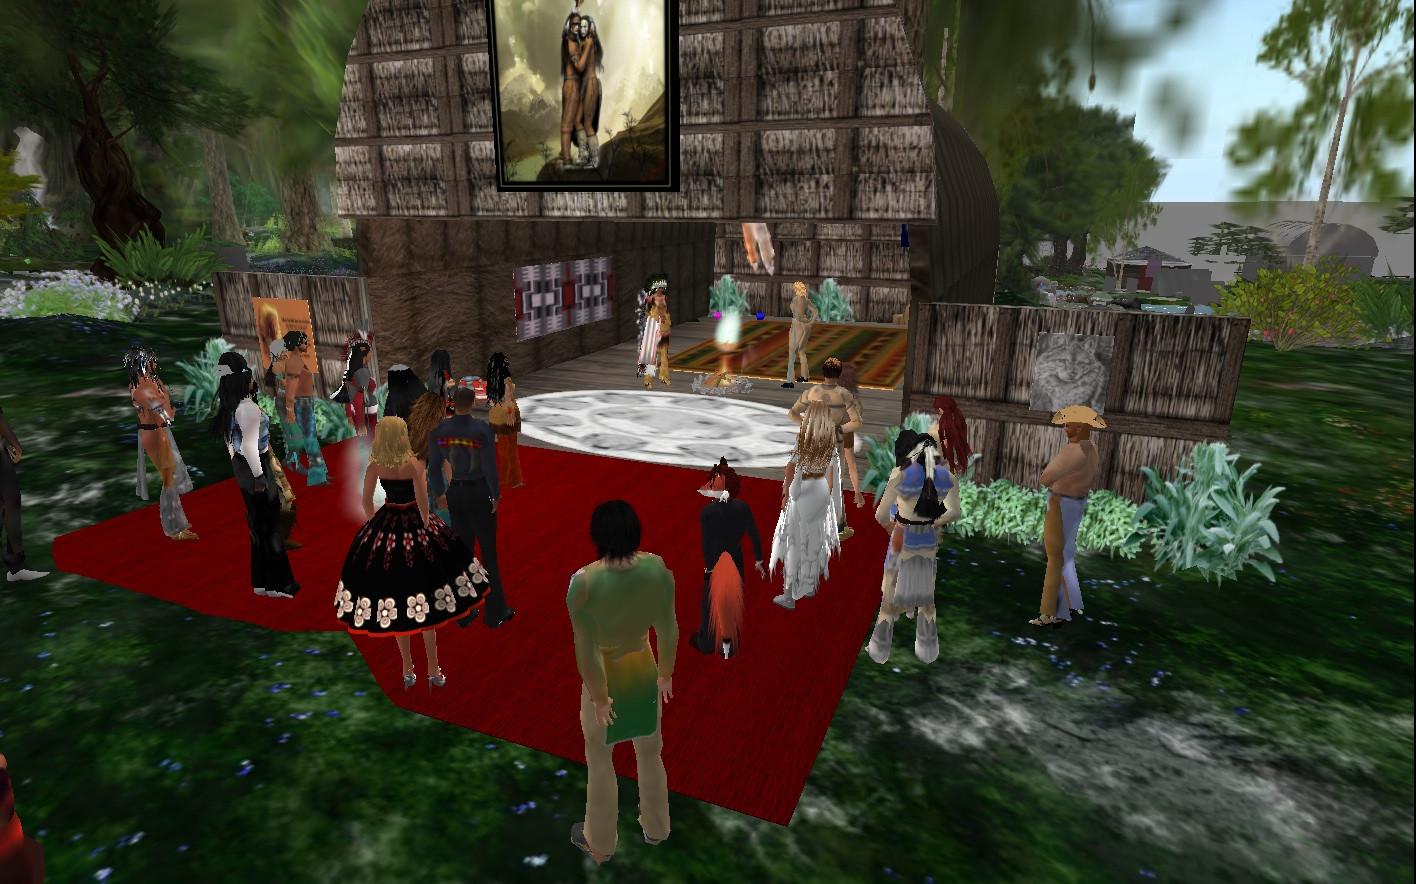 Cherokee Wedding Vows  SL Newser People Pint and Krams' Cherokee Wedding